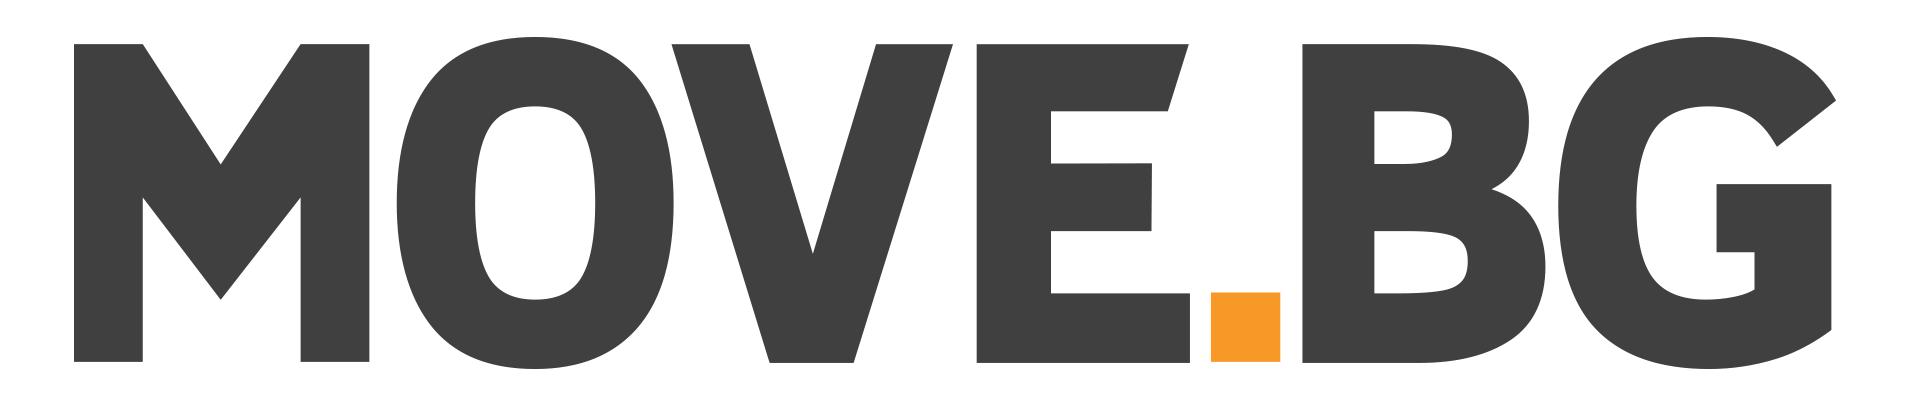 movebg-logo